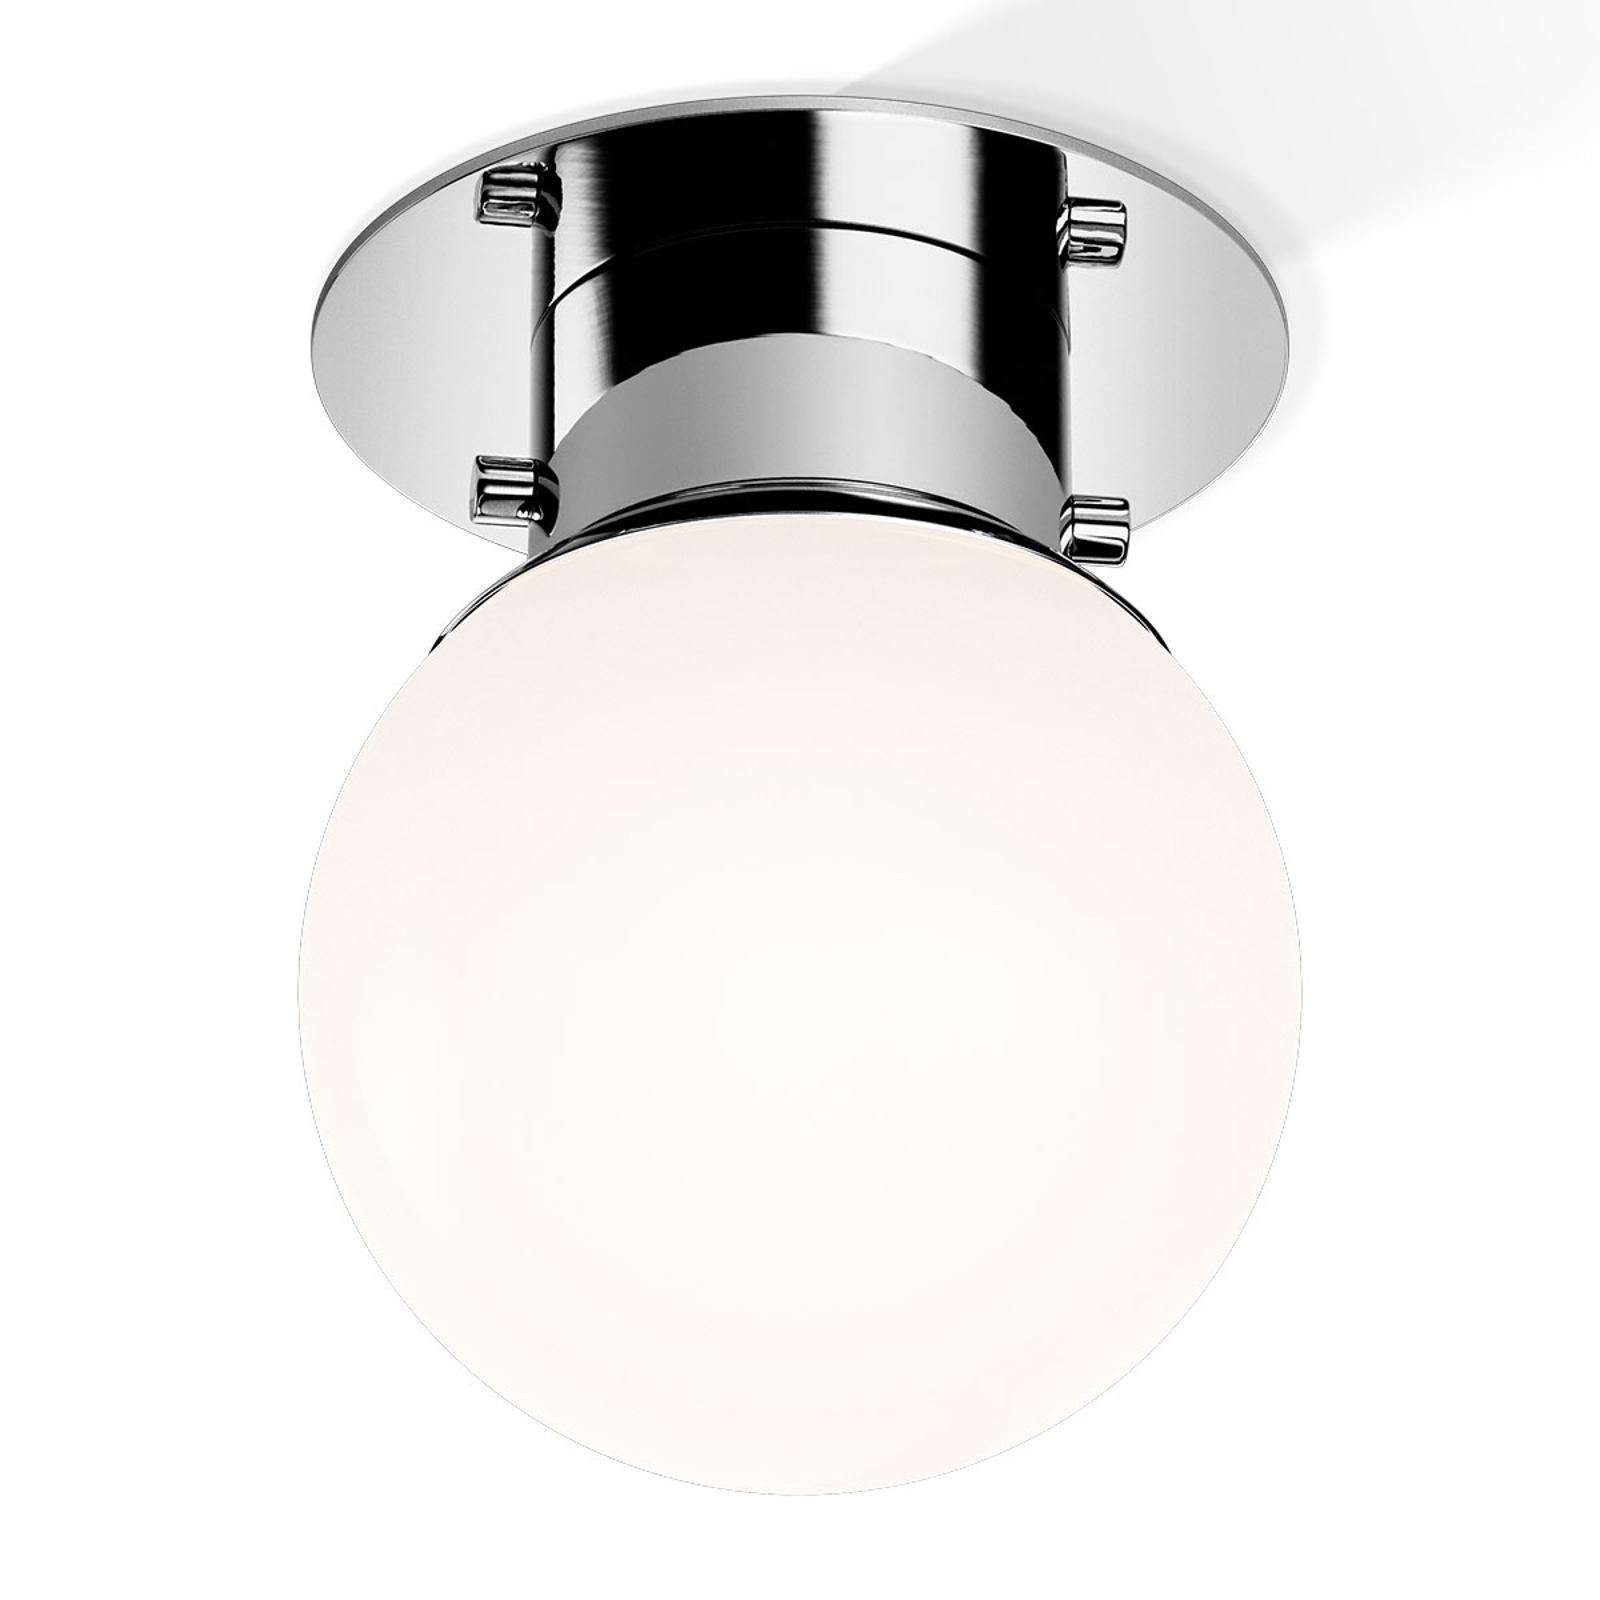 Decor Walther Globe guľové stropné svietidlo chróm